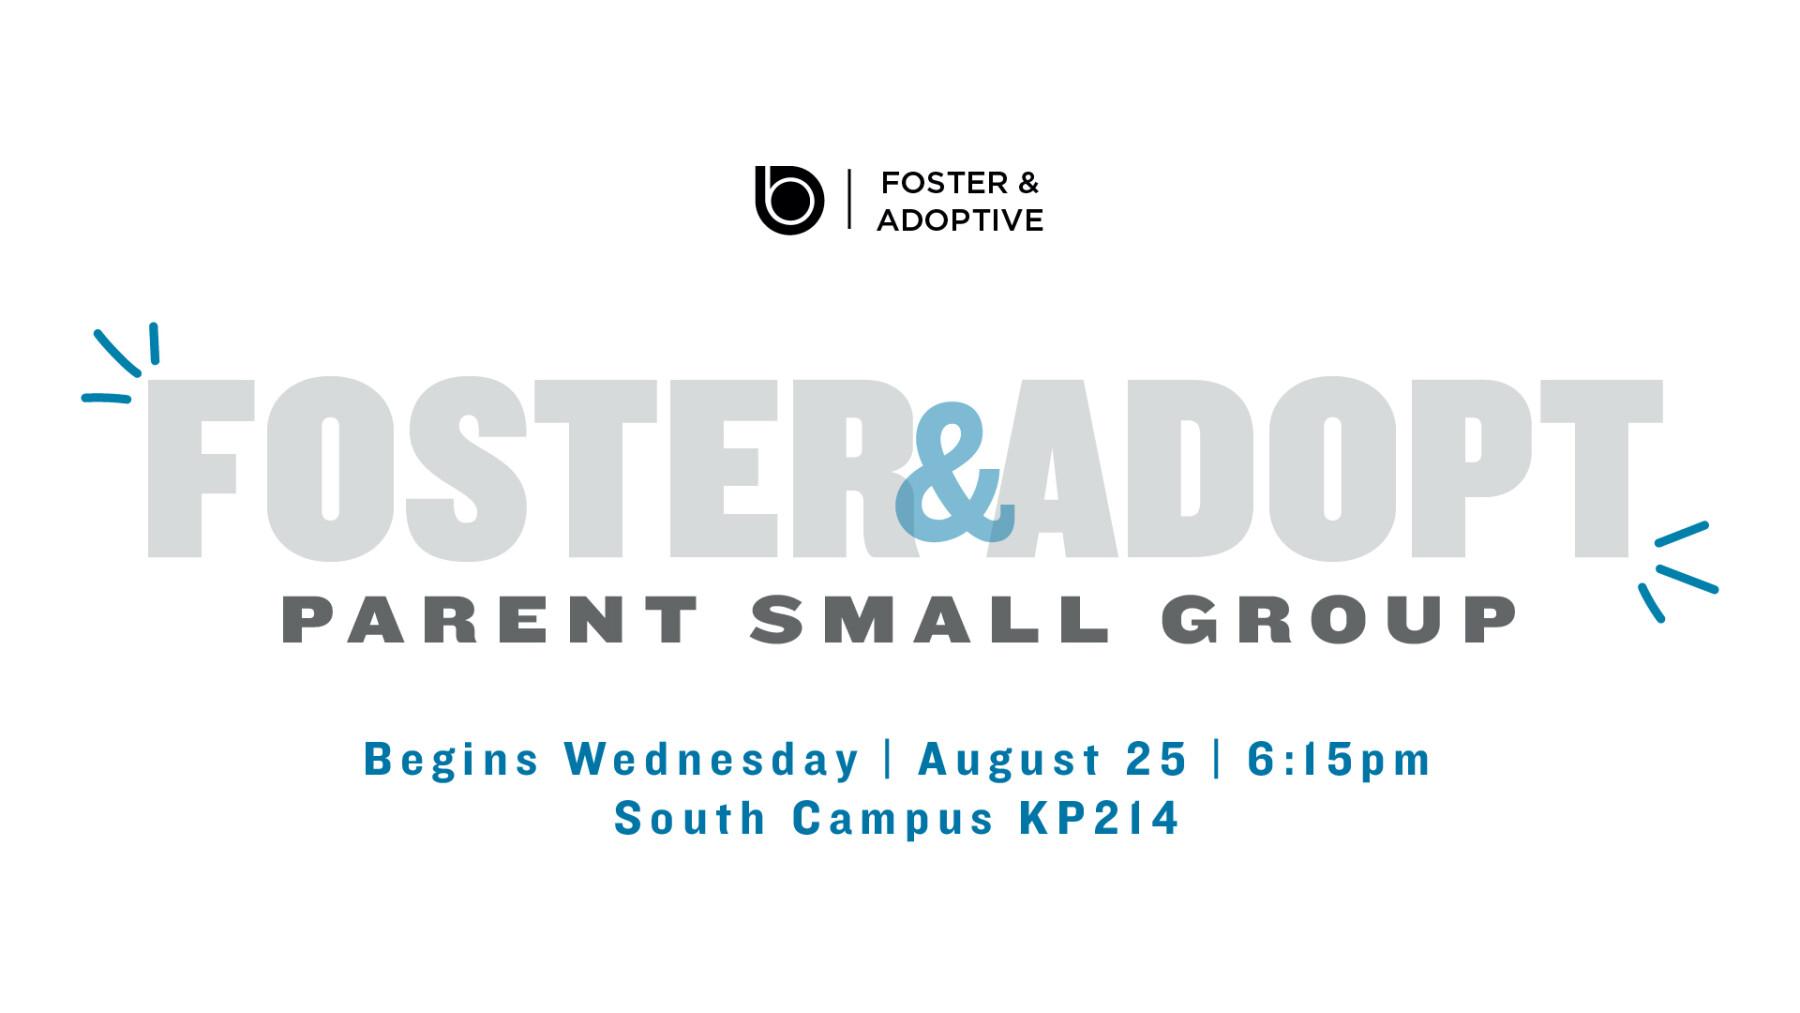 Foster Adoptive Parent Small Group